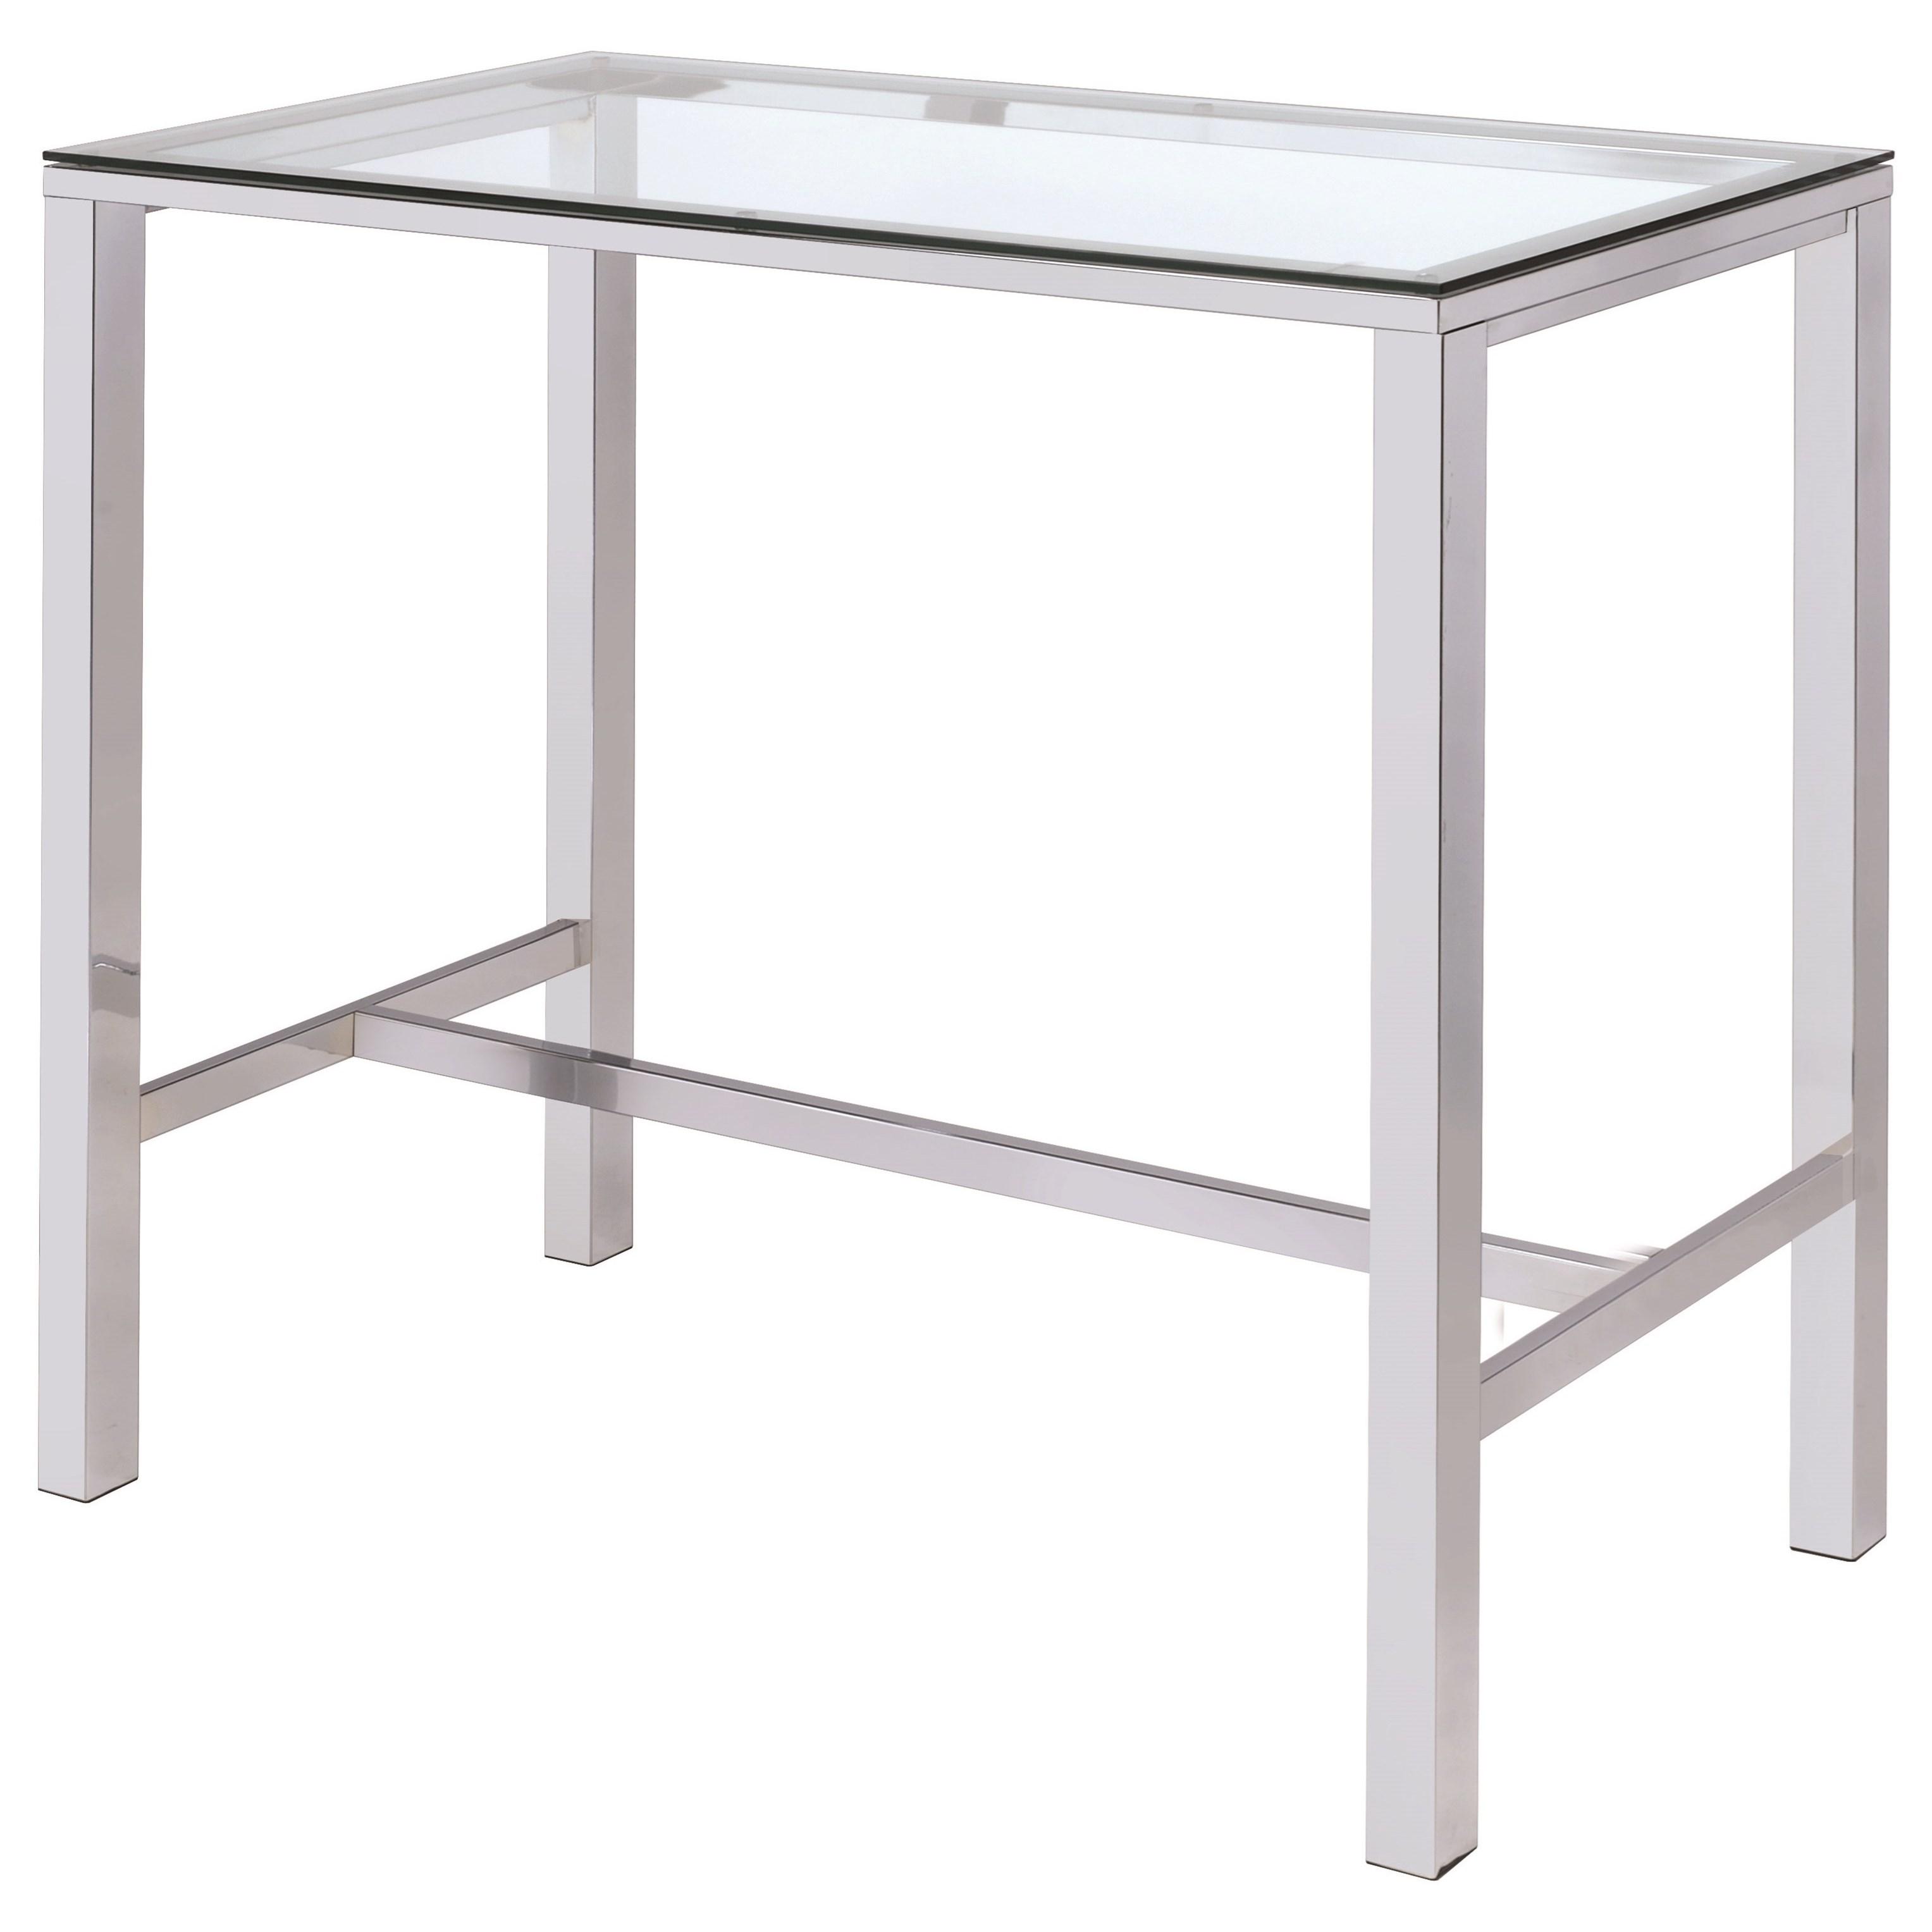 Bar Units and Bar Tables Bar Table by Coaster at Lapeer Furniture & Mattress Center